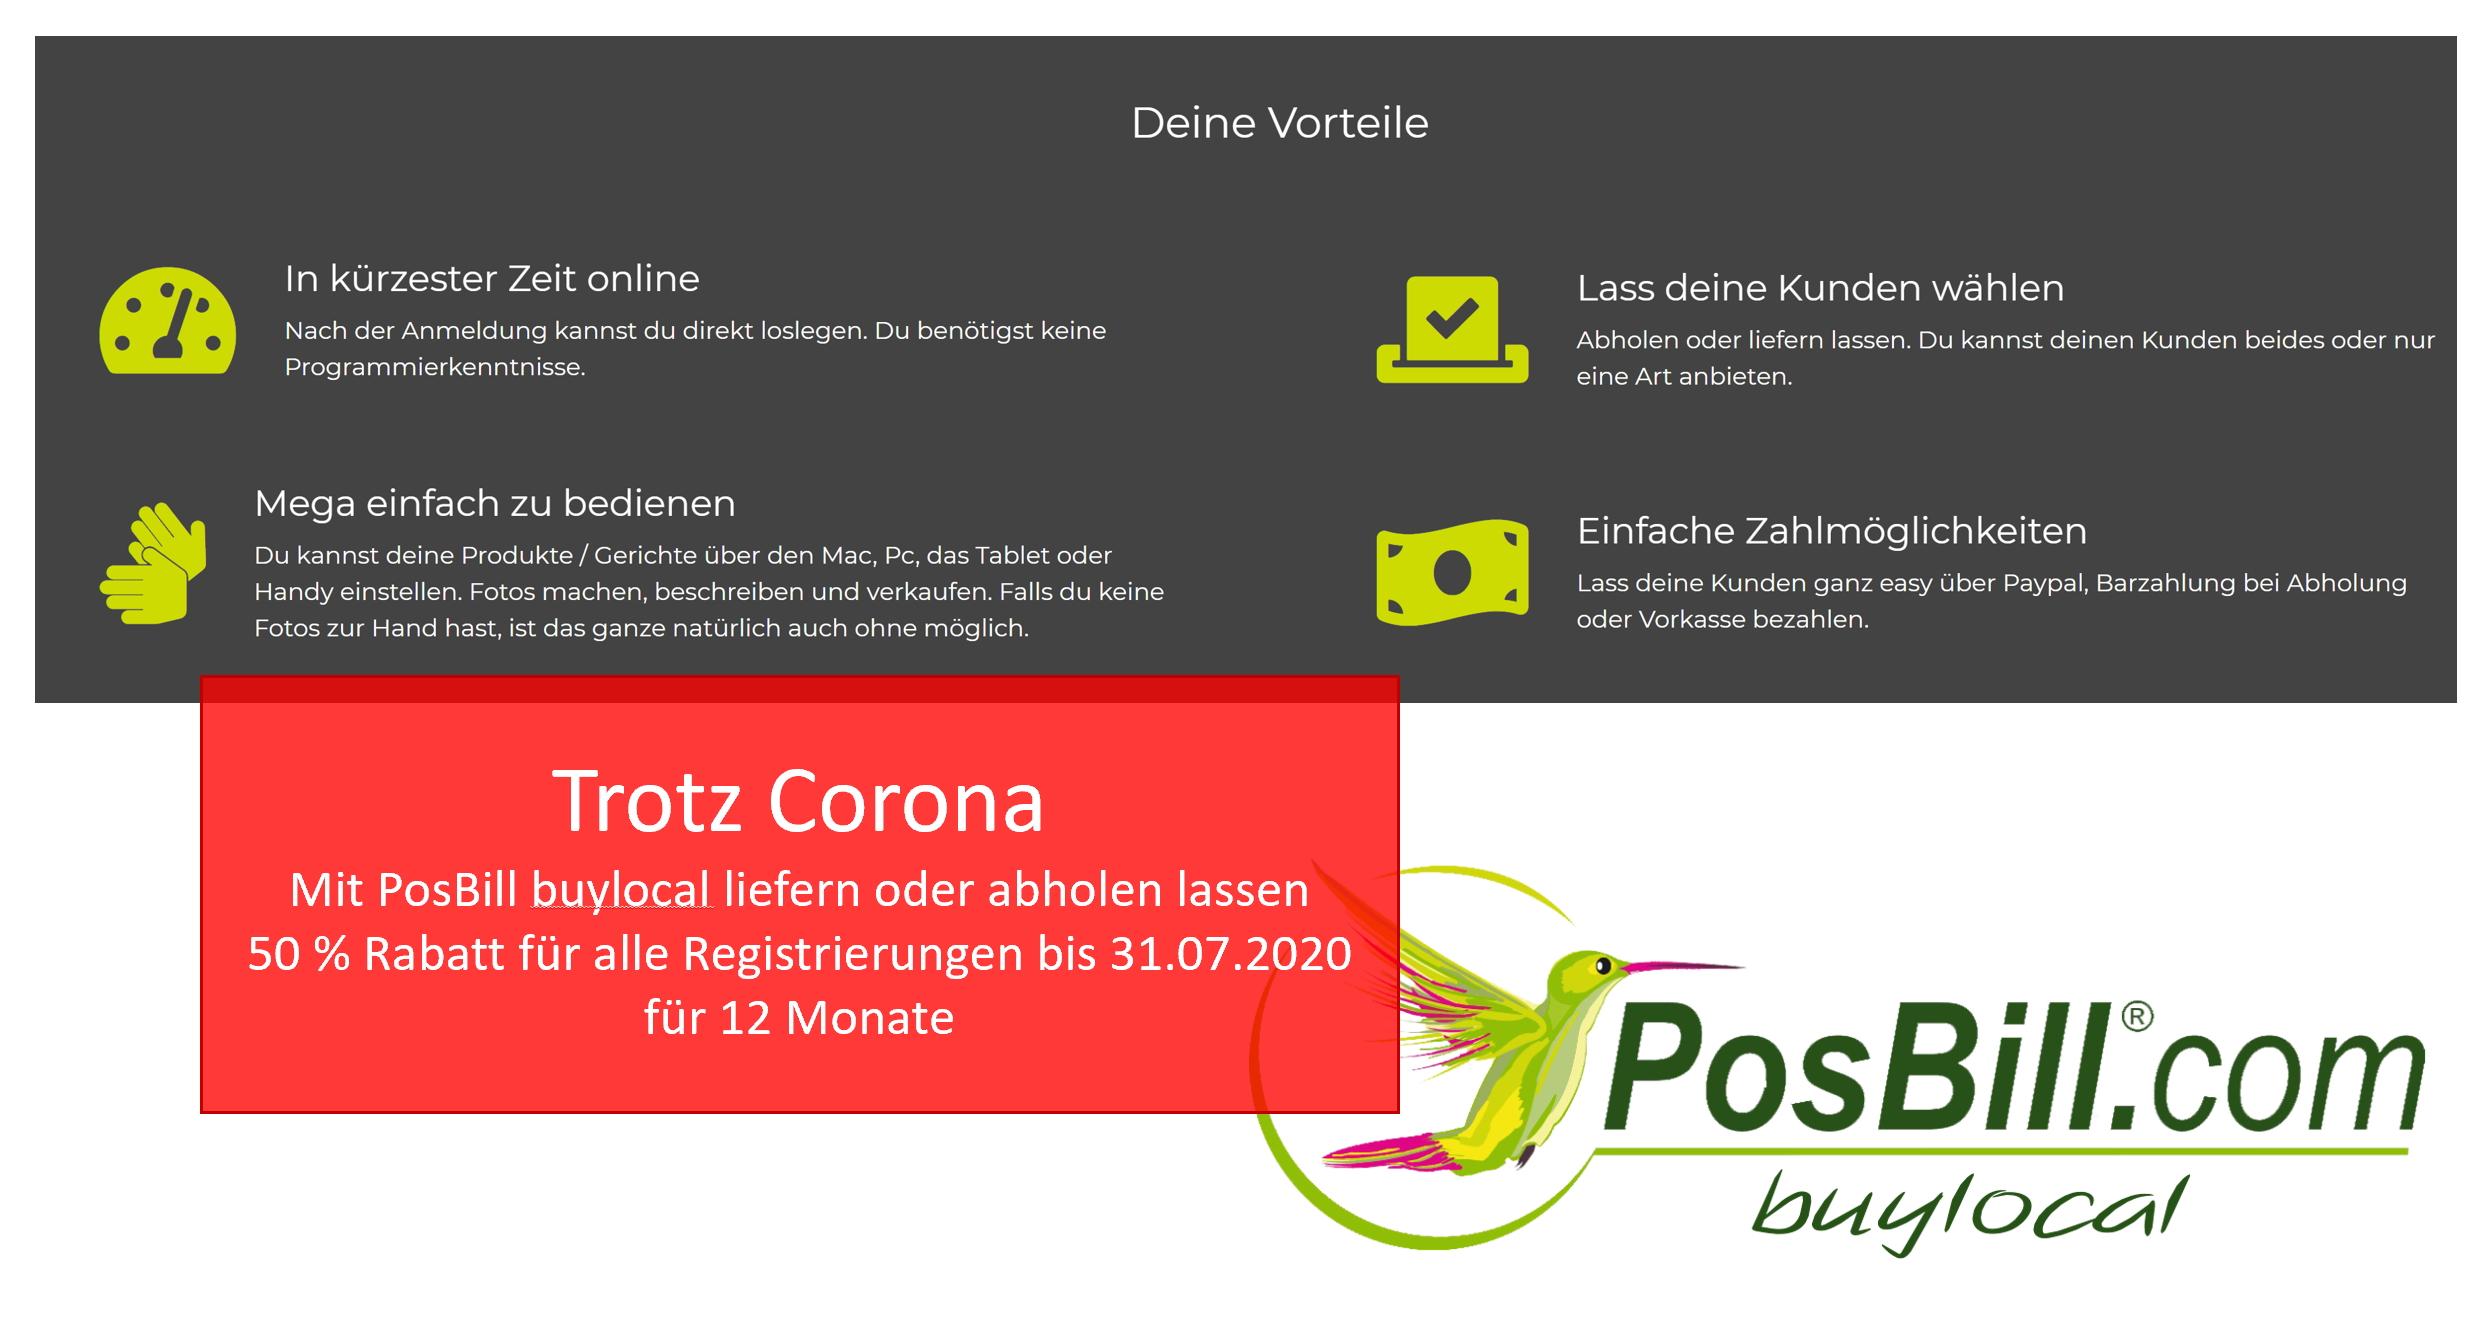 Trotz Corona geschäftsfähig bleiben - mit PosBill buylocal